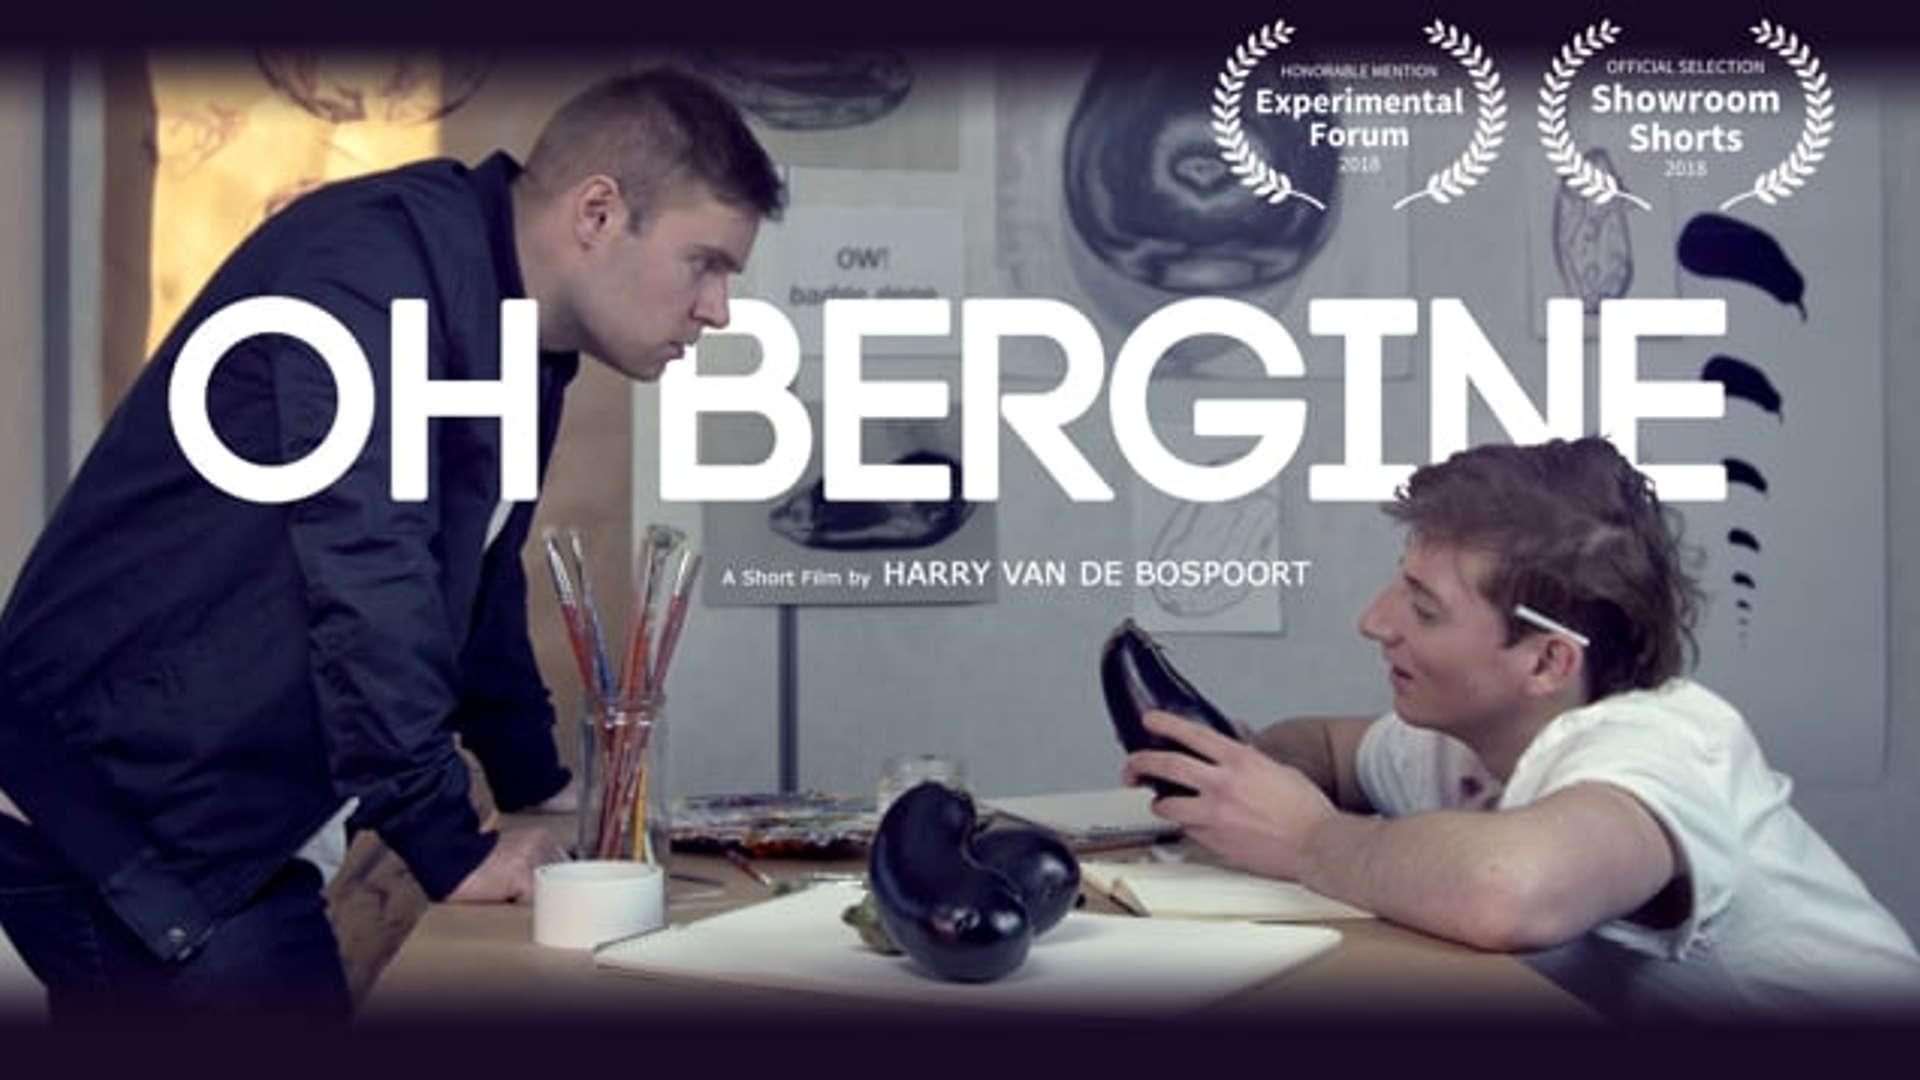 OH BERGINE - Experimental Short Film